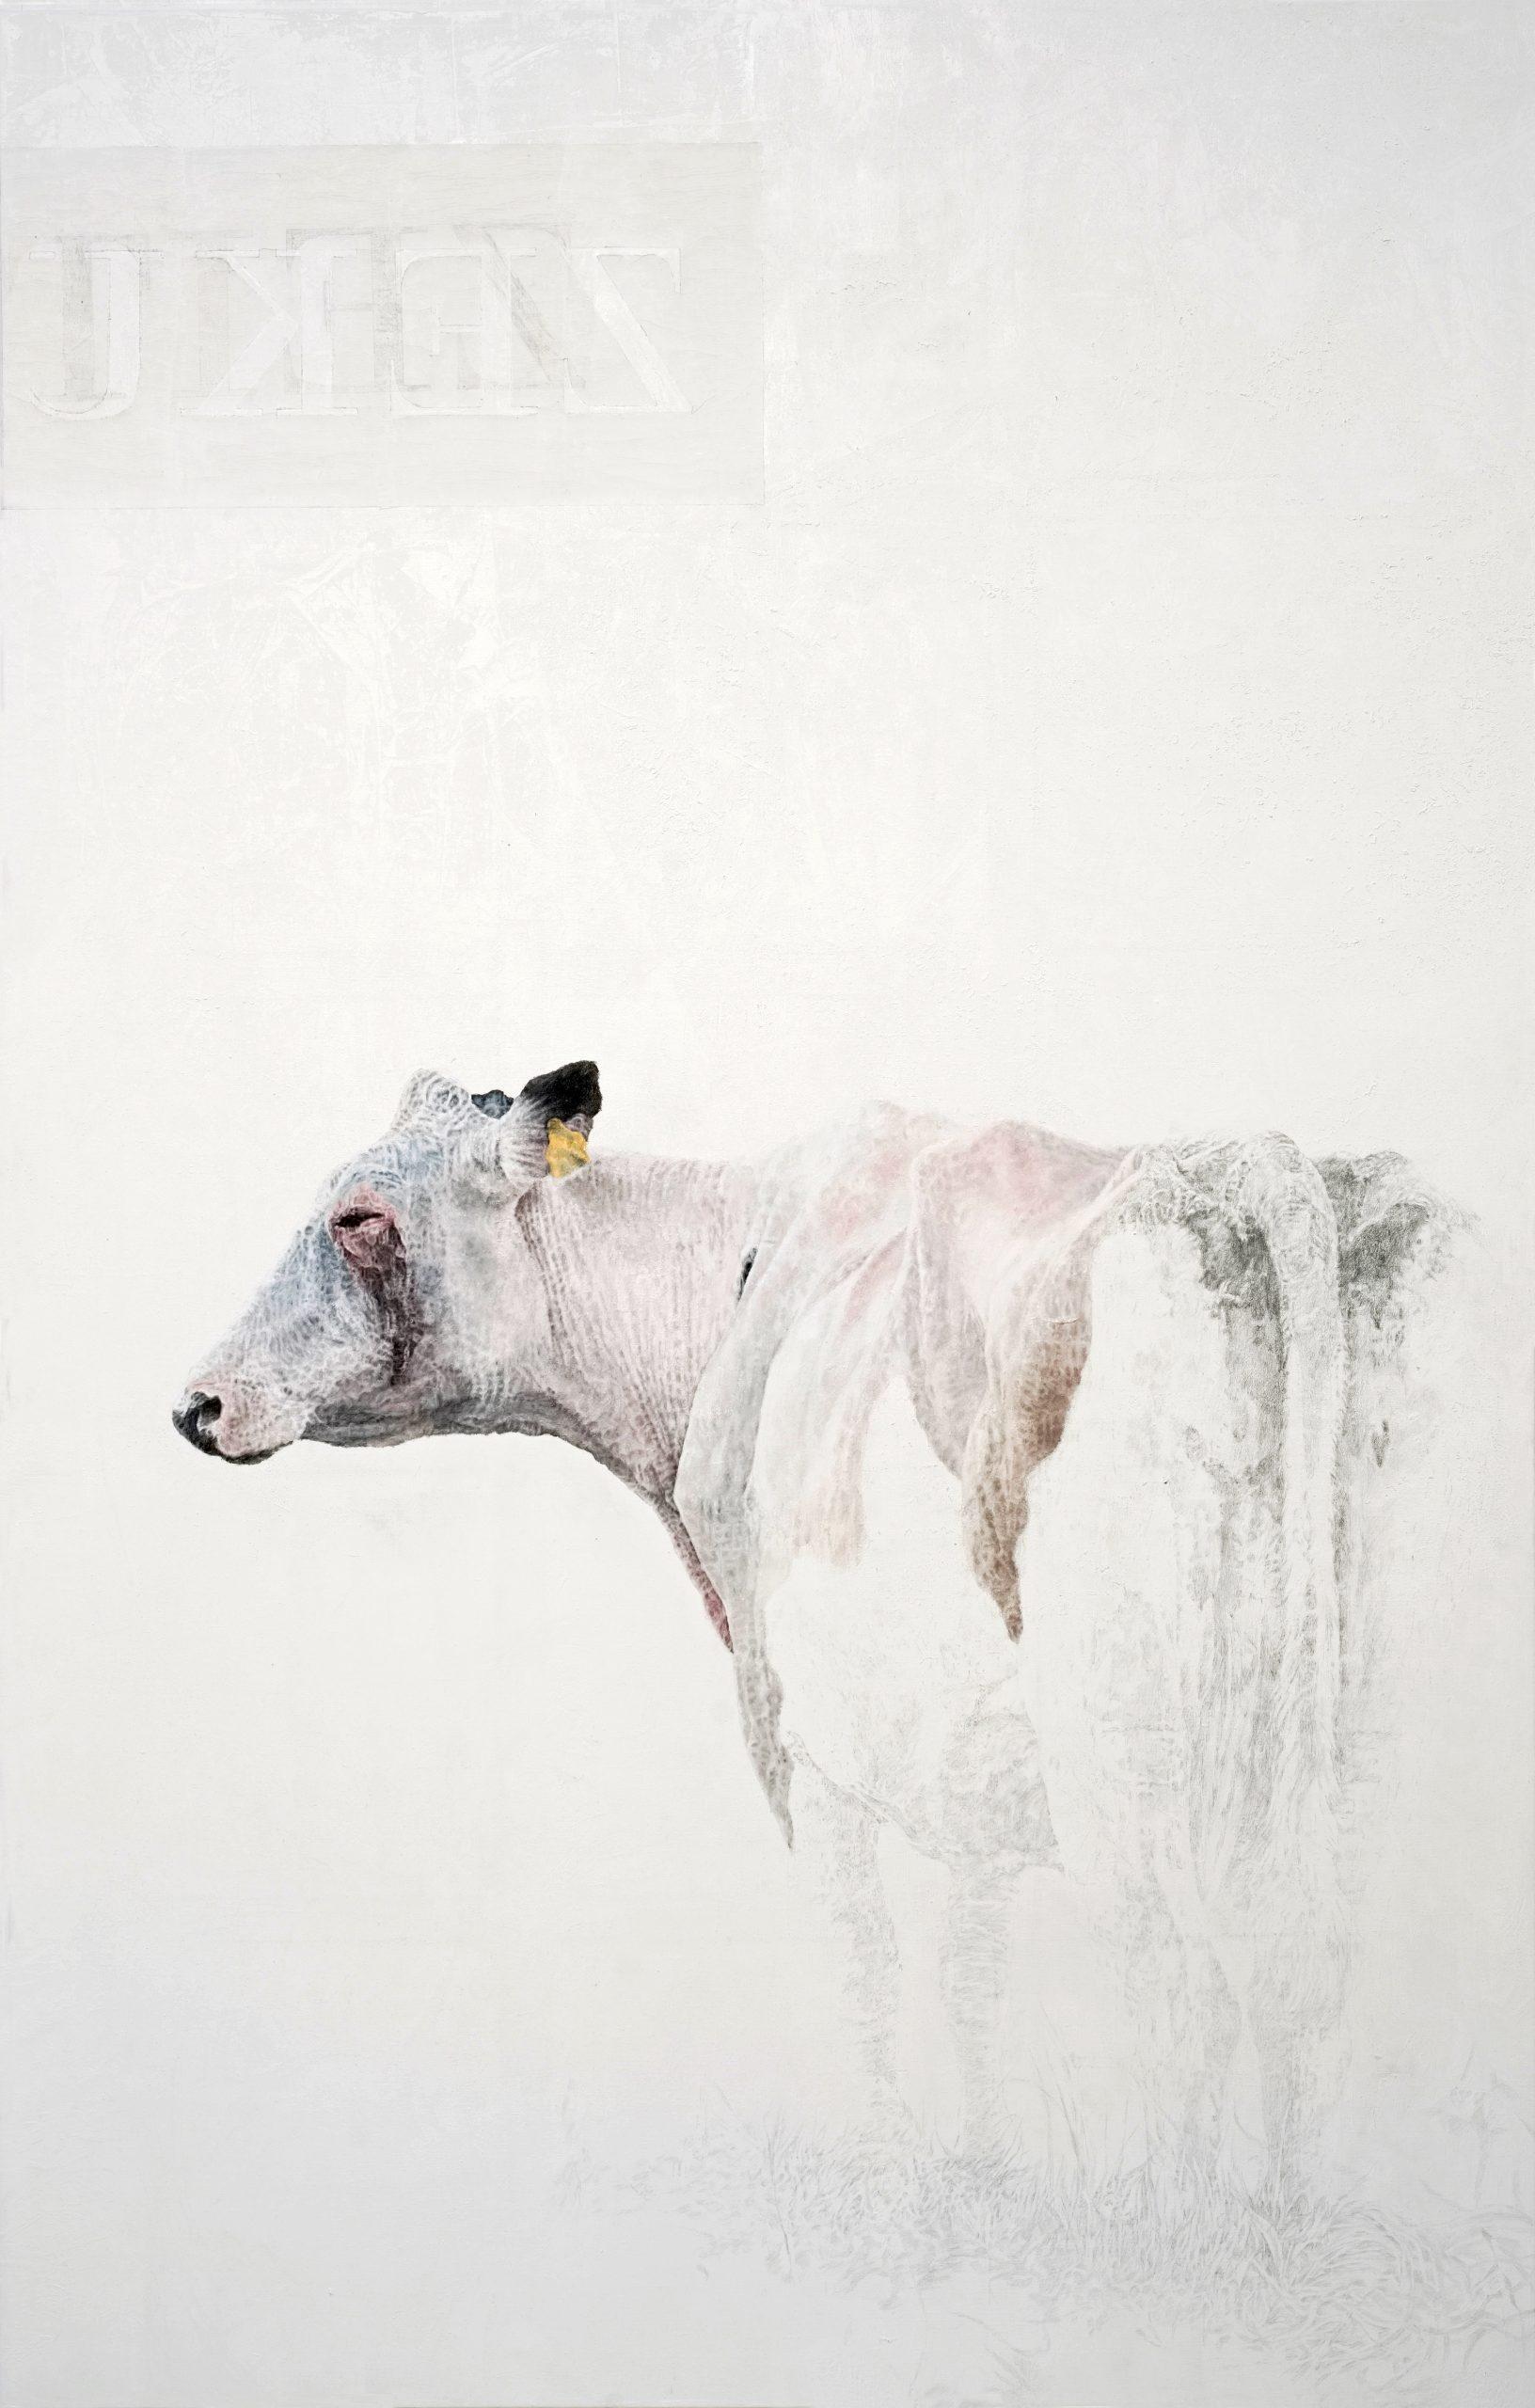 Die Kuh (ZEKU), 2020, Öl, Bleisti, 220 x 140 cm